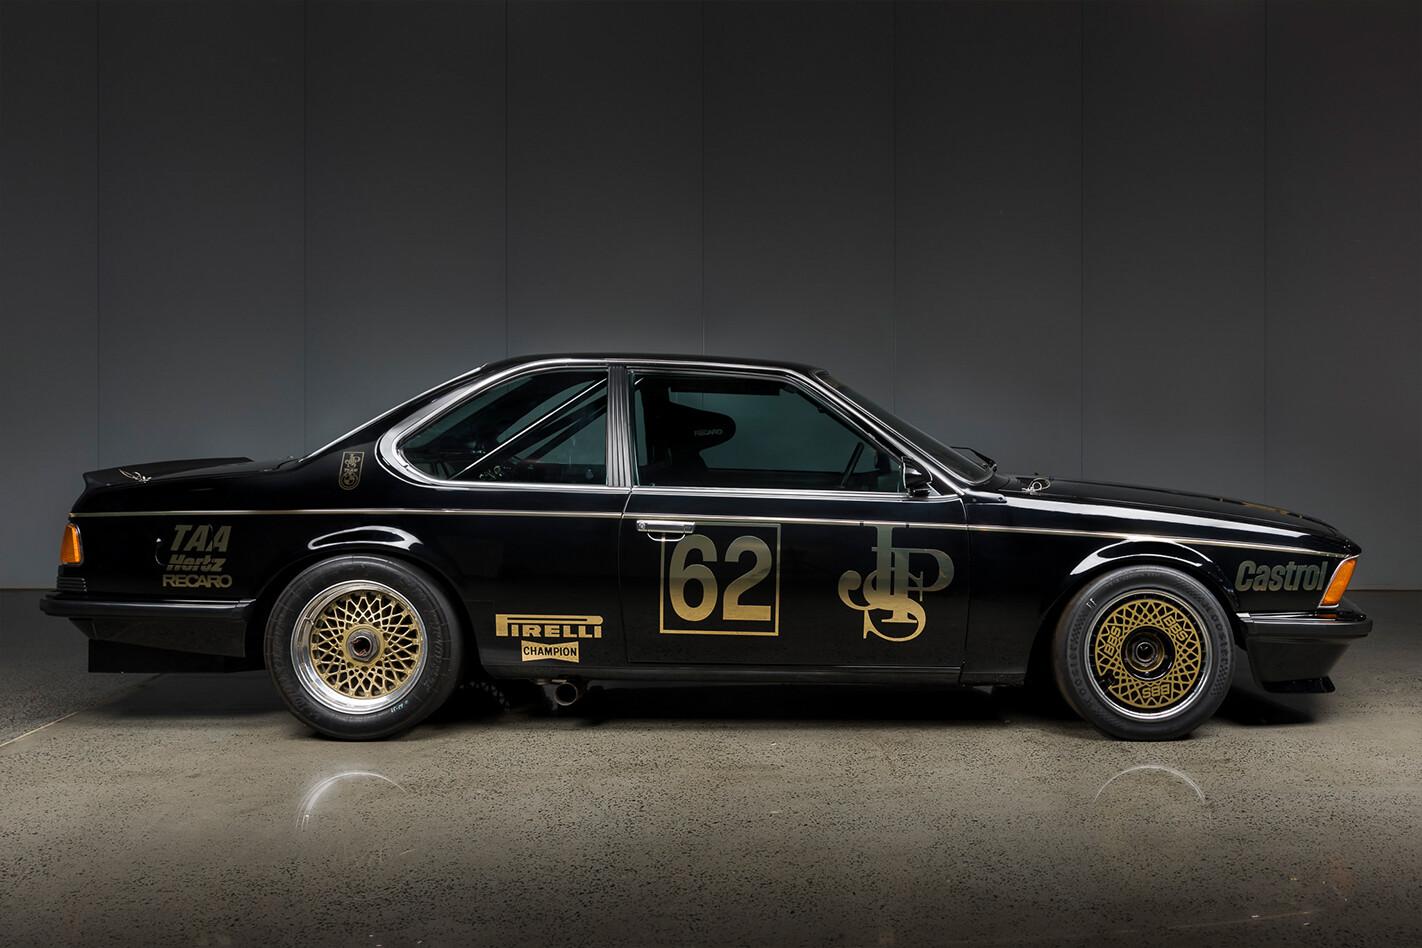 Jim Richards BMW 635 Group A Side Jpg